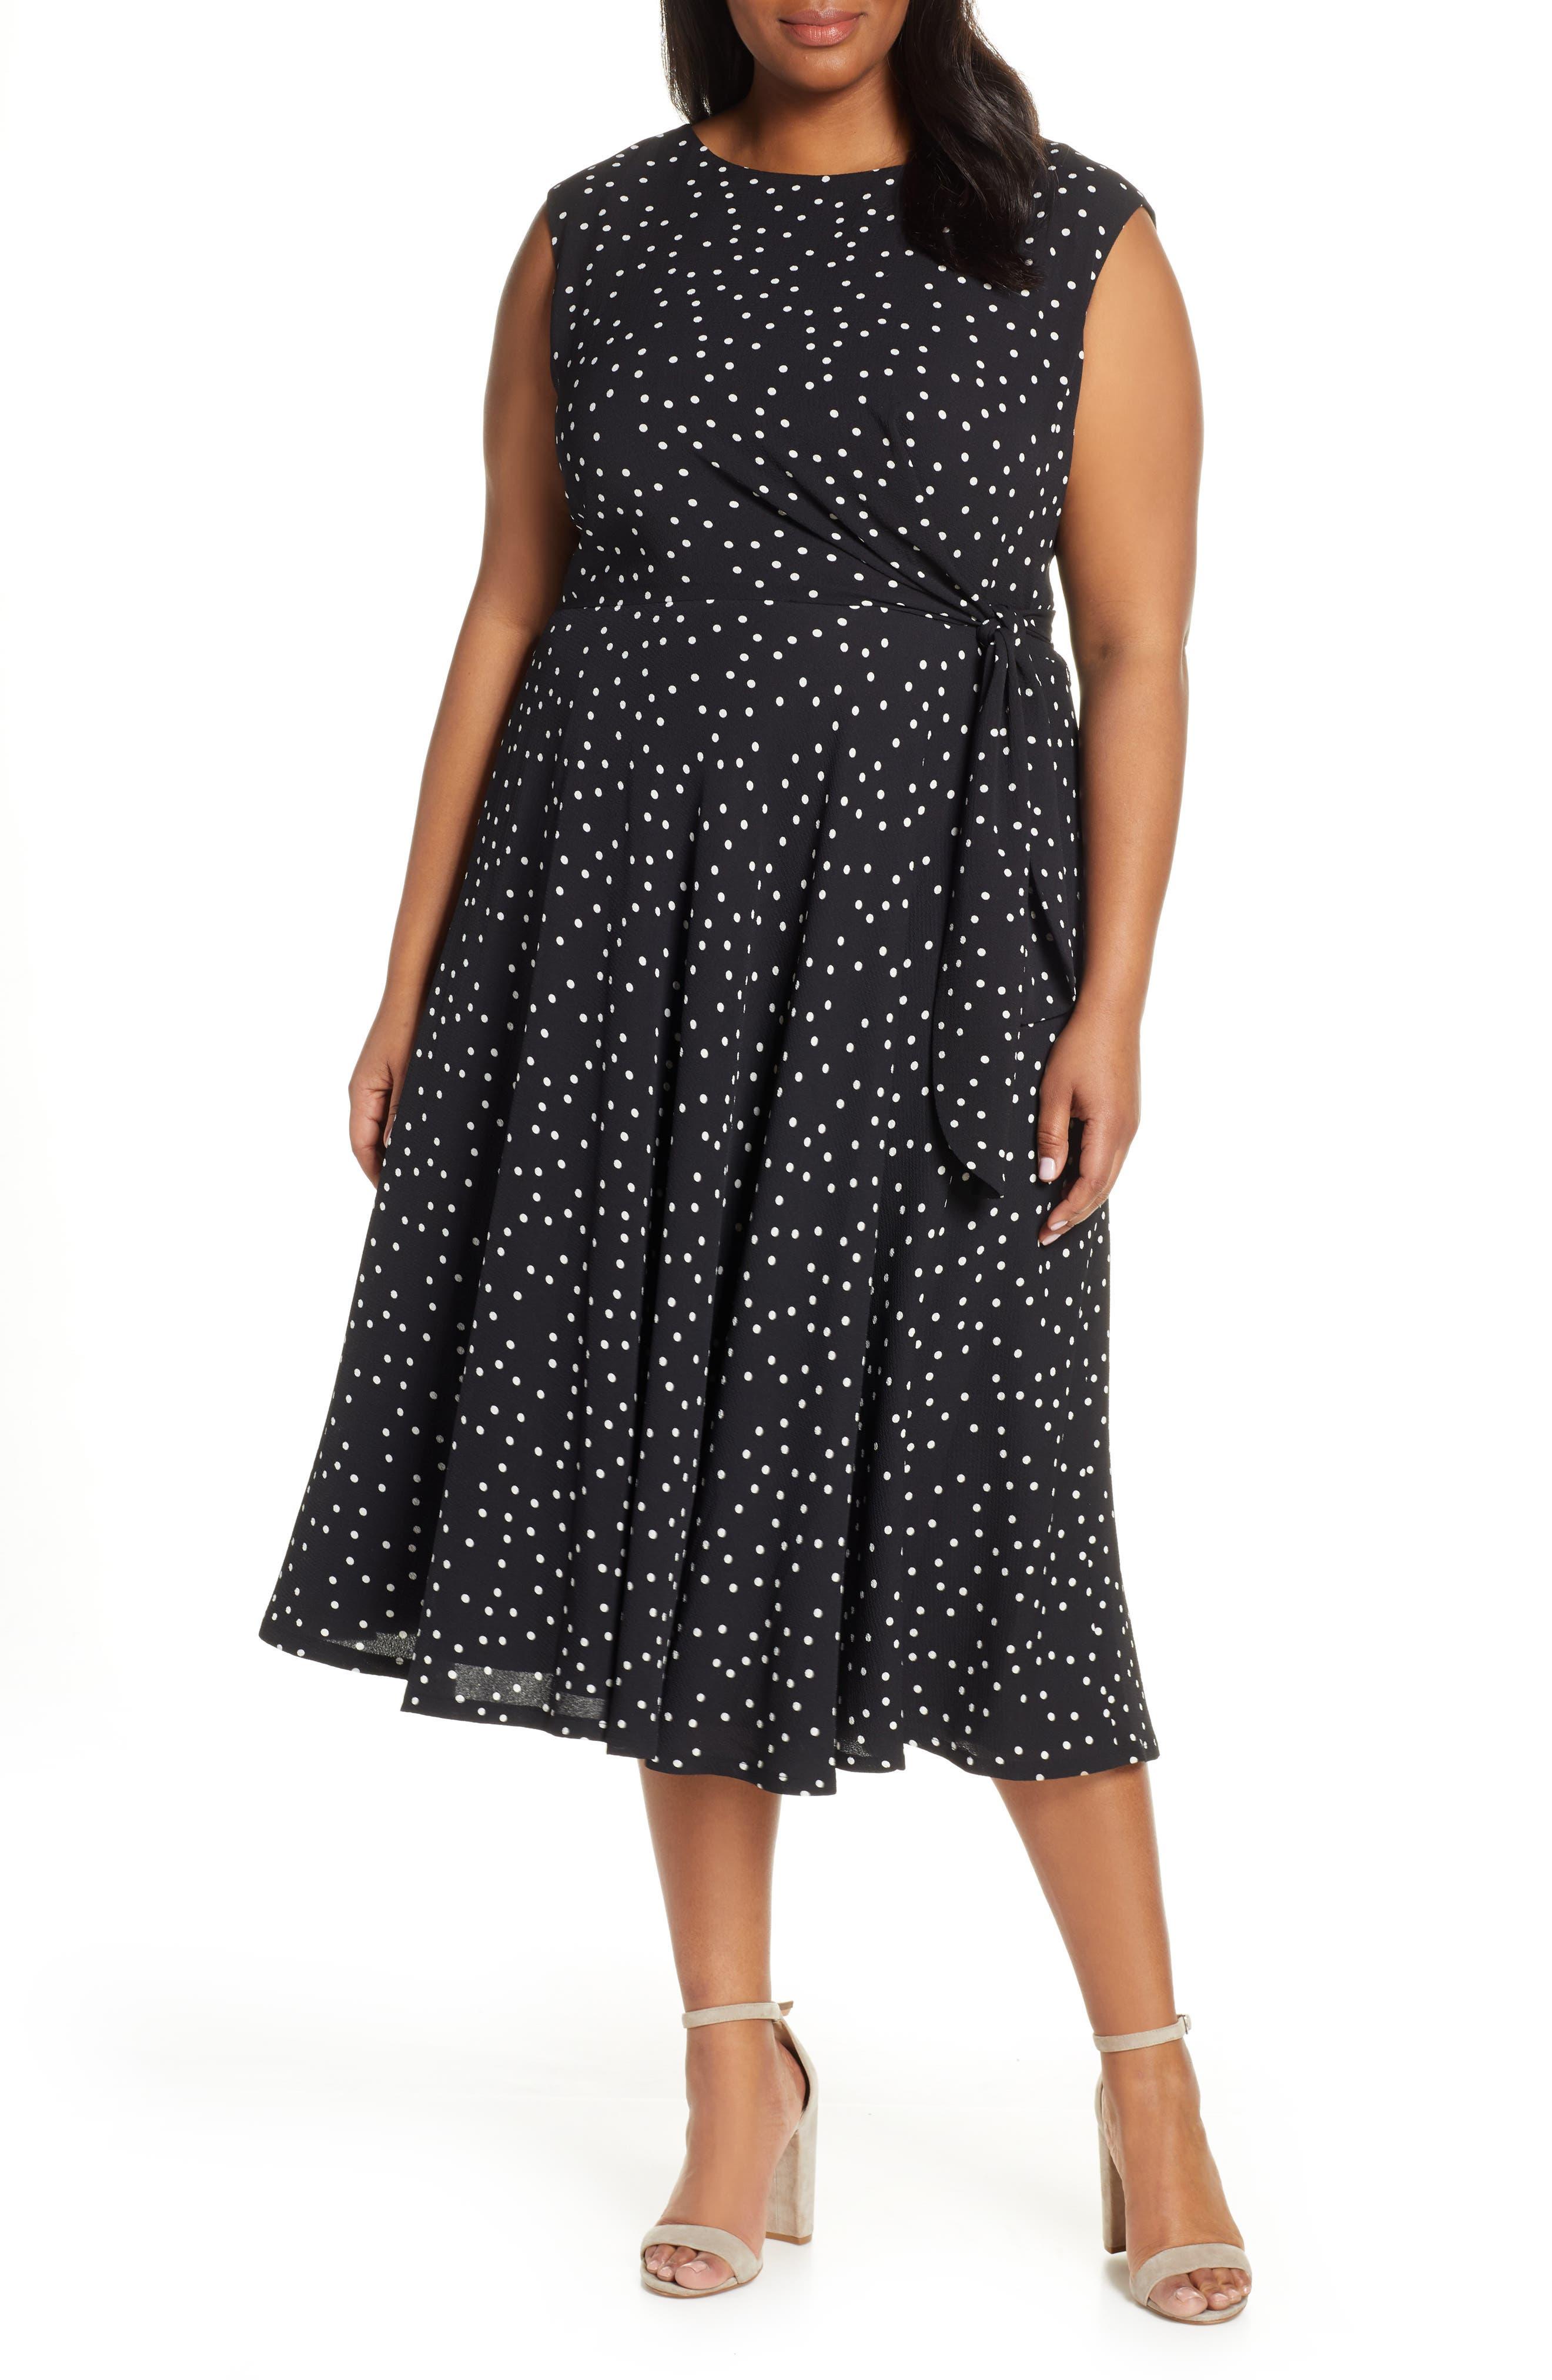 1930s Art Deco Plus Size Dresses   Tea Dresses, Party Dresses Plus Size Womens Tahari Polka Dot Fit  Flare Midi Dress $138.00 AT vintagedancer.com